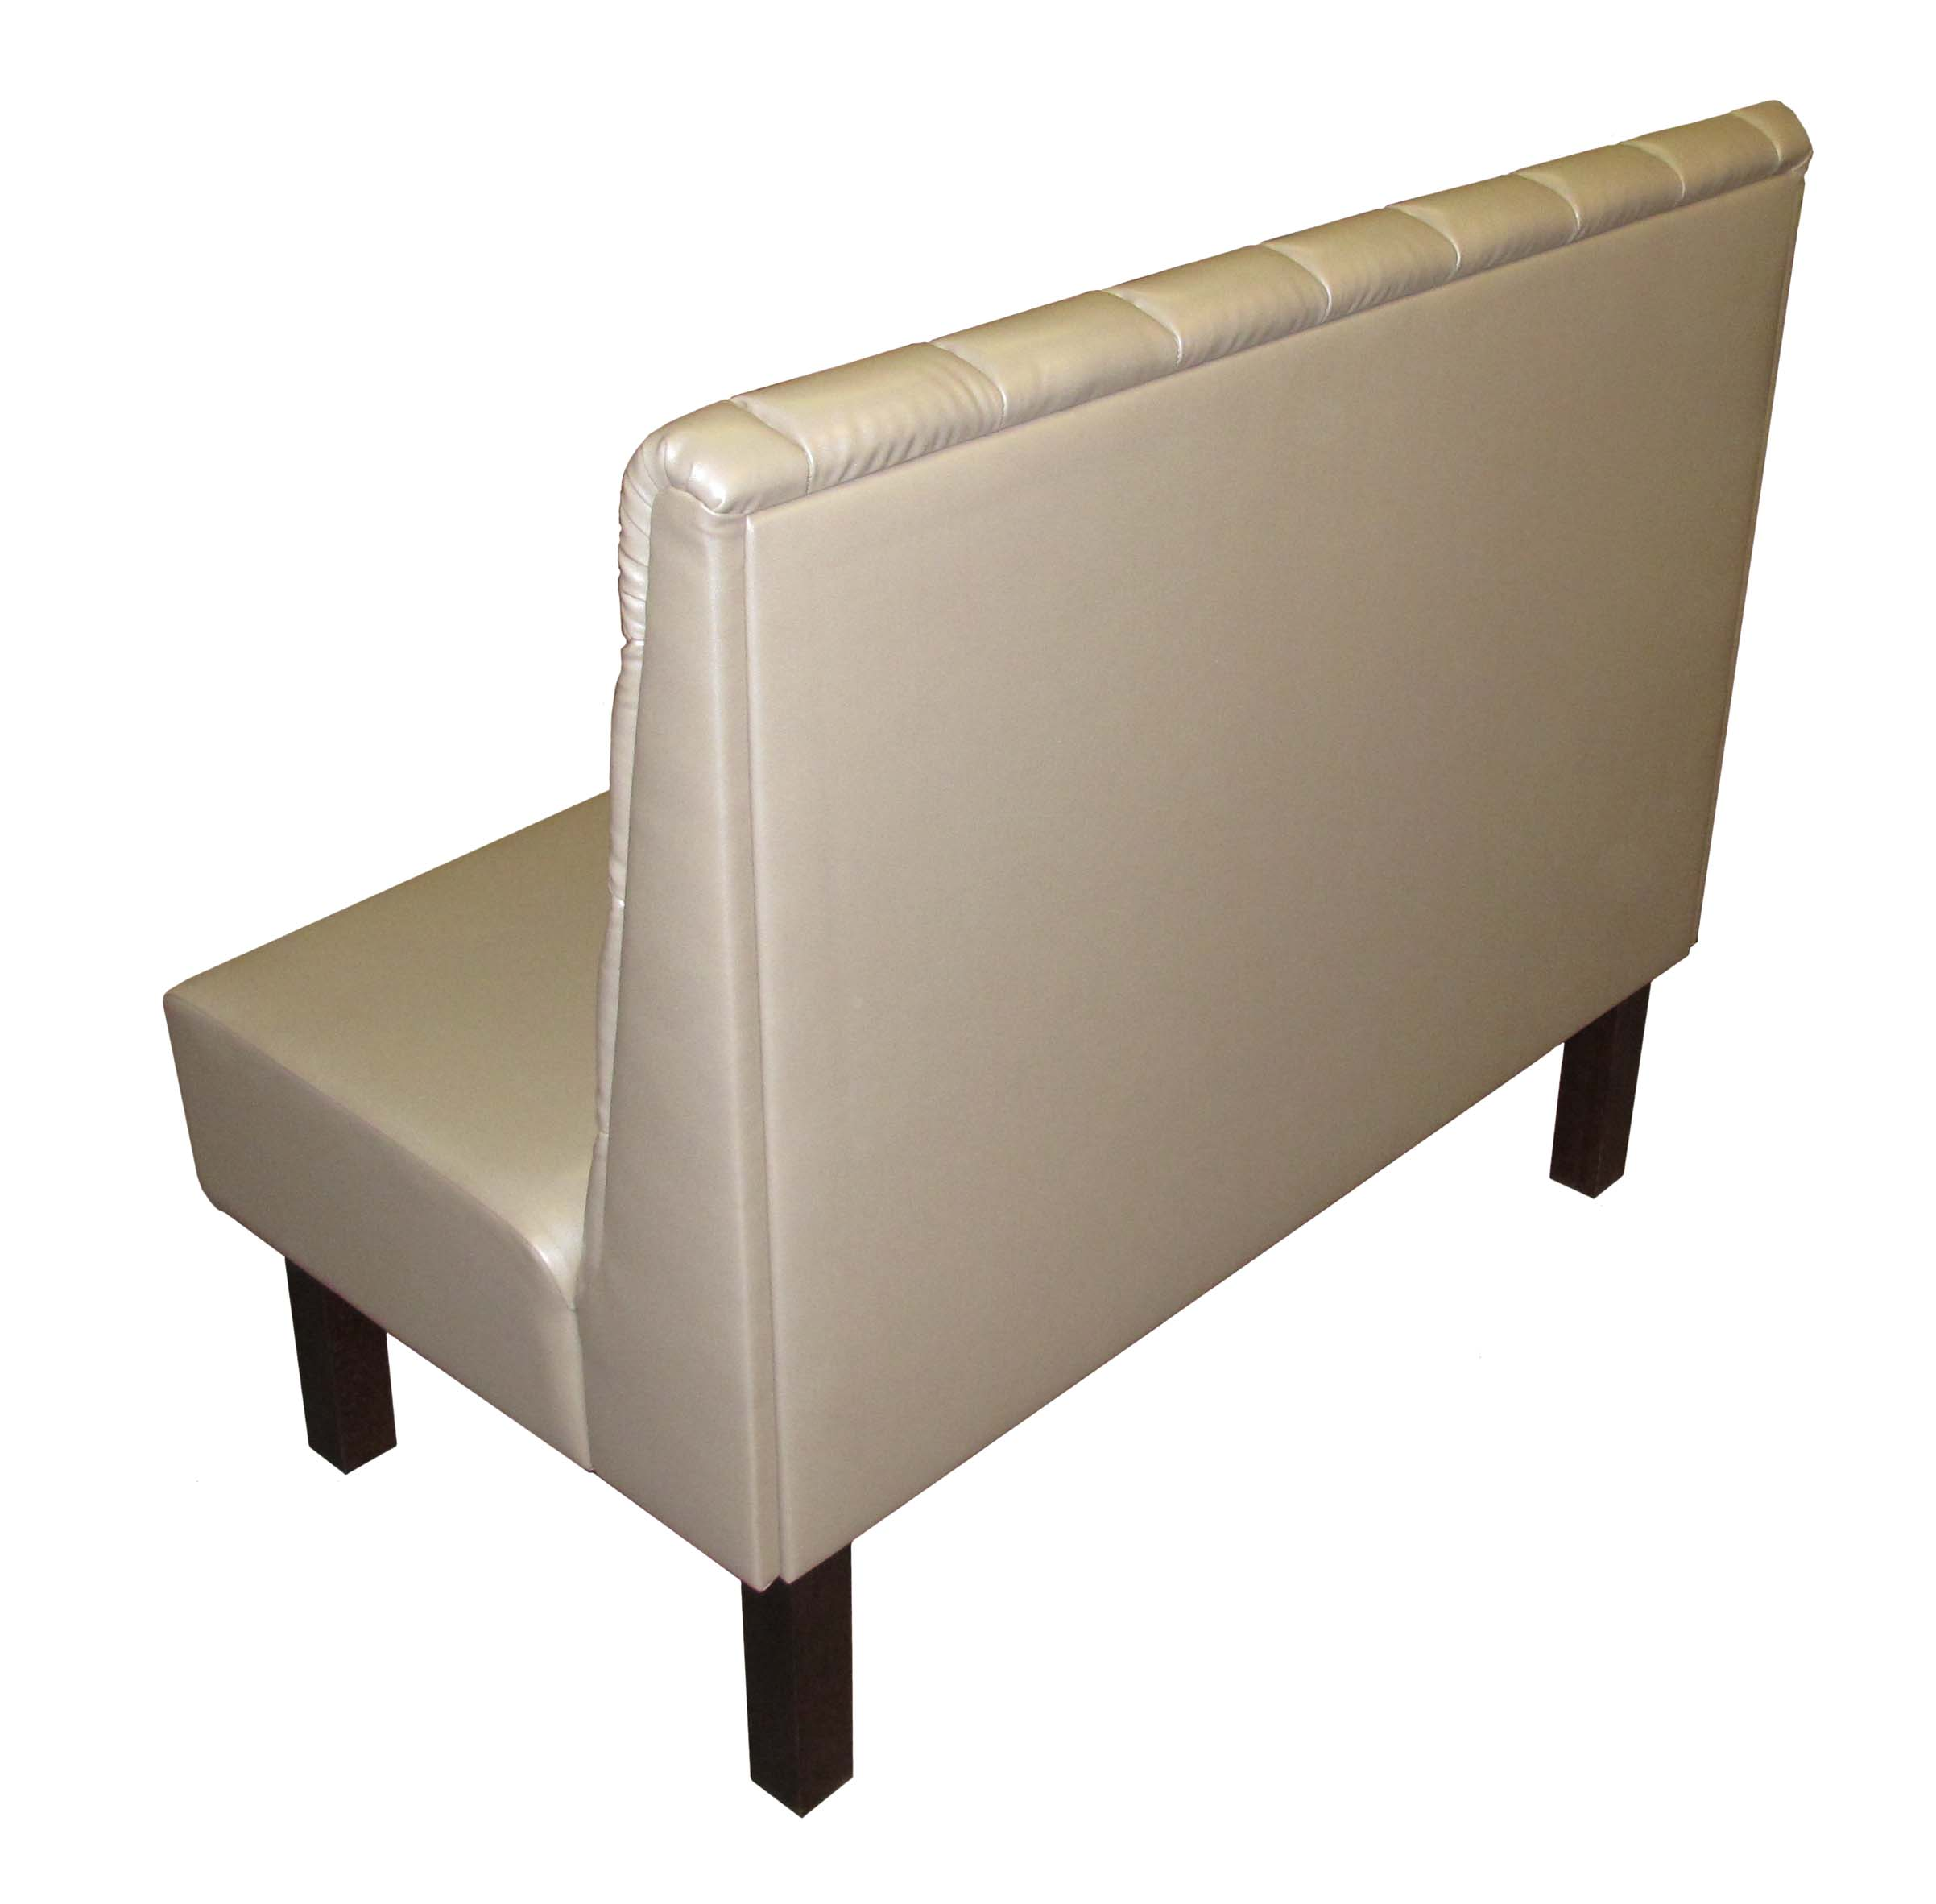 sitzbank gastronomie interesting gastro sitzbank retro. Black Bedroom Furniture Sets. Home Design Ideas